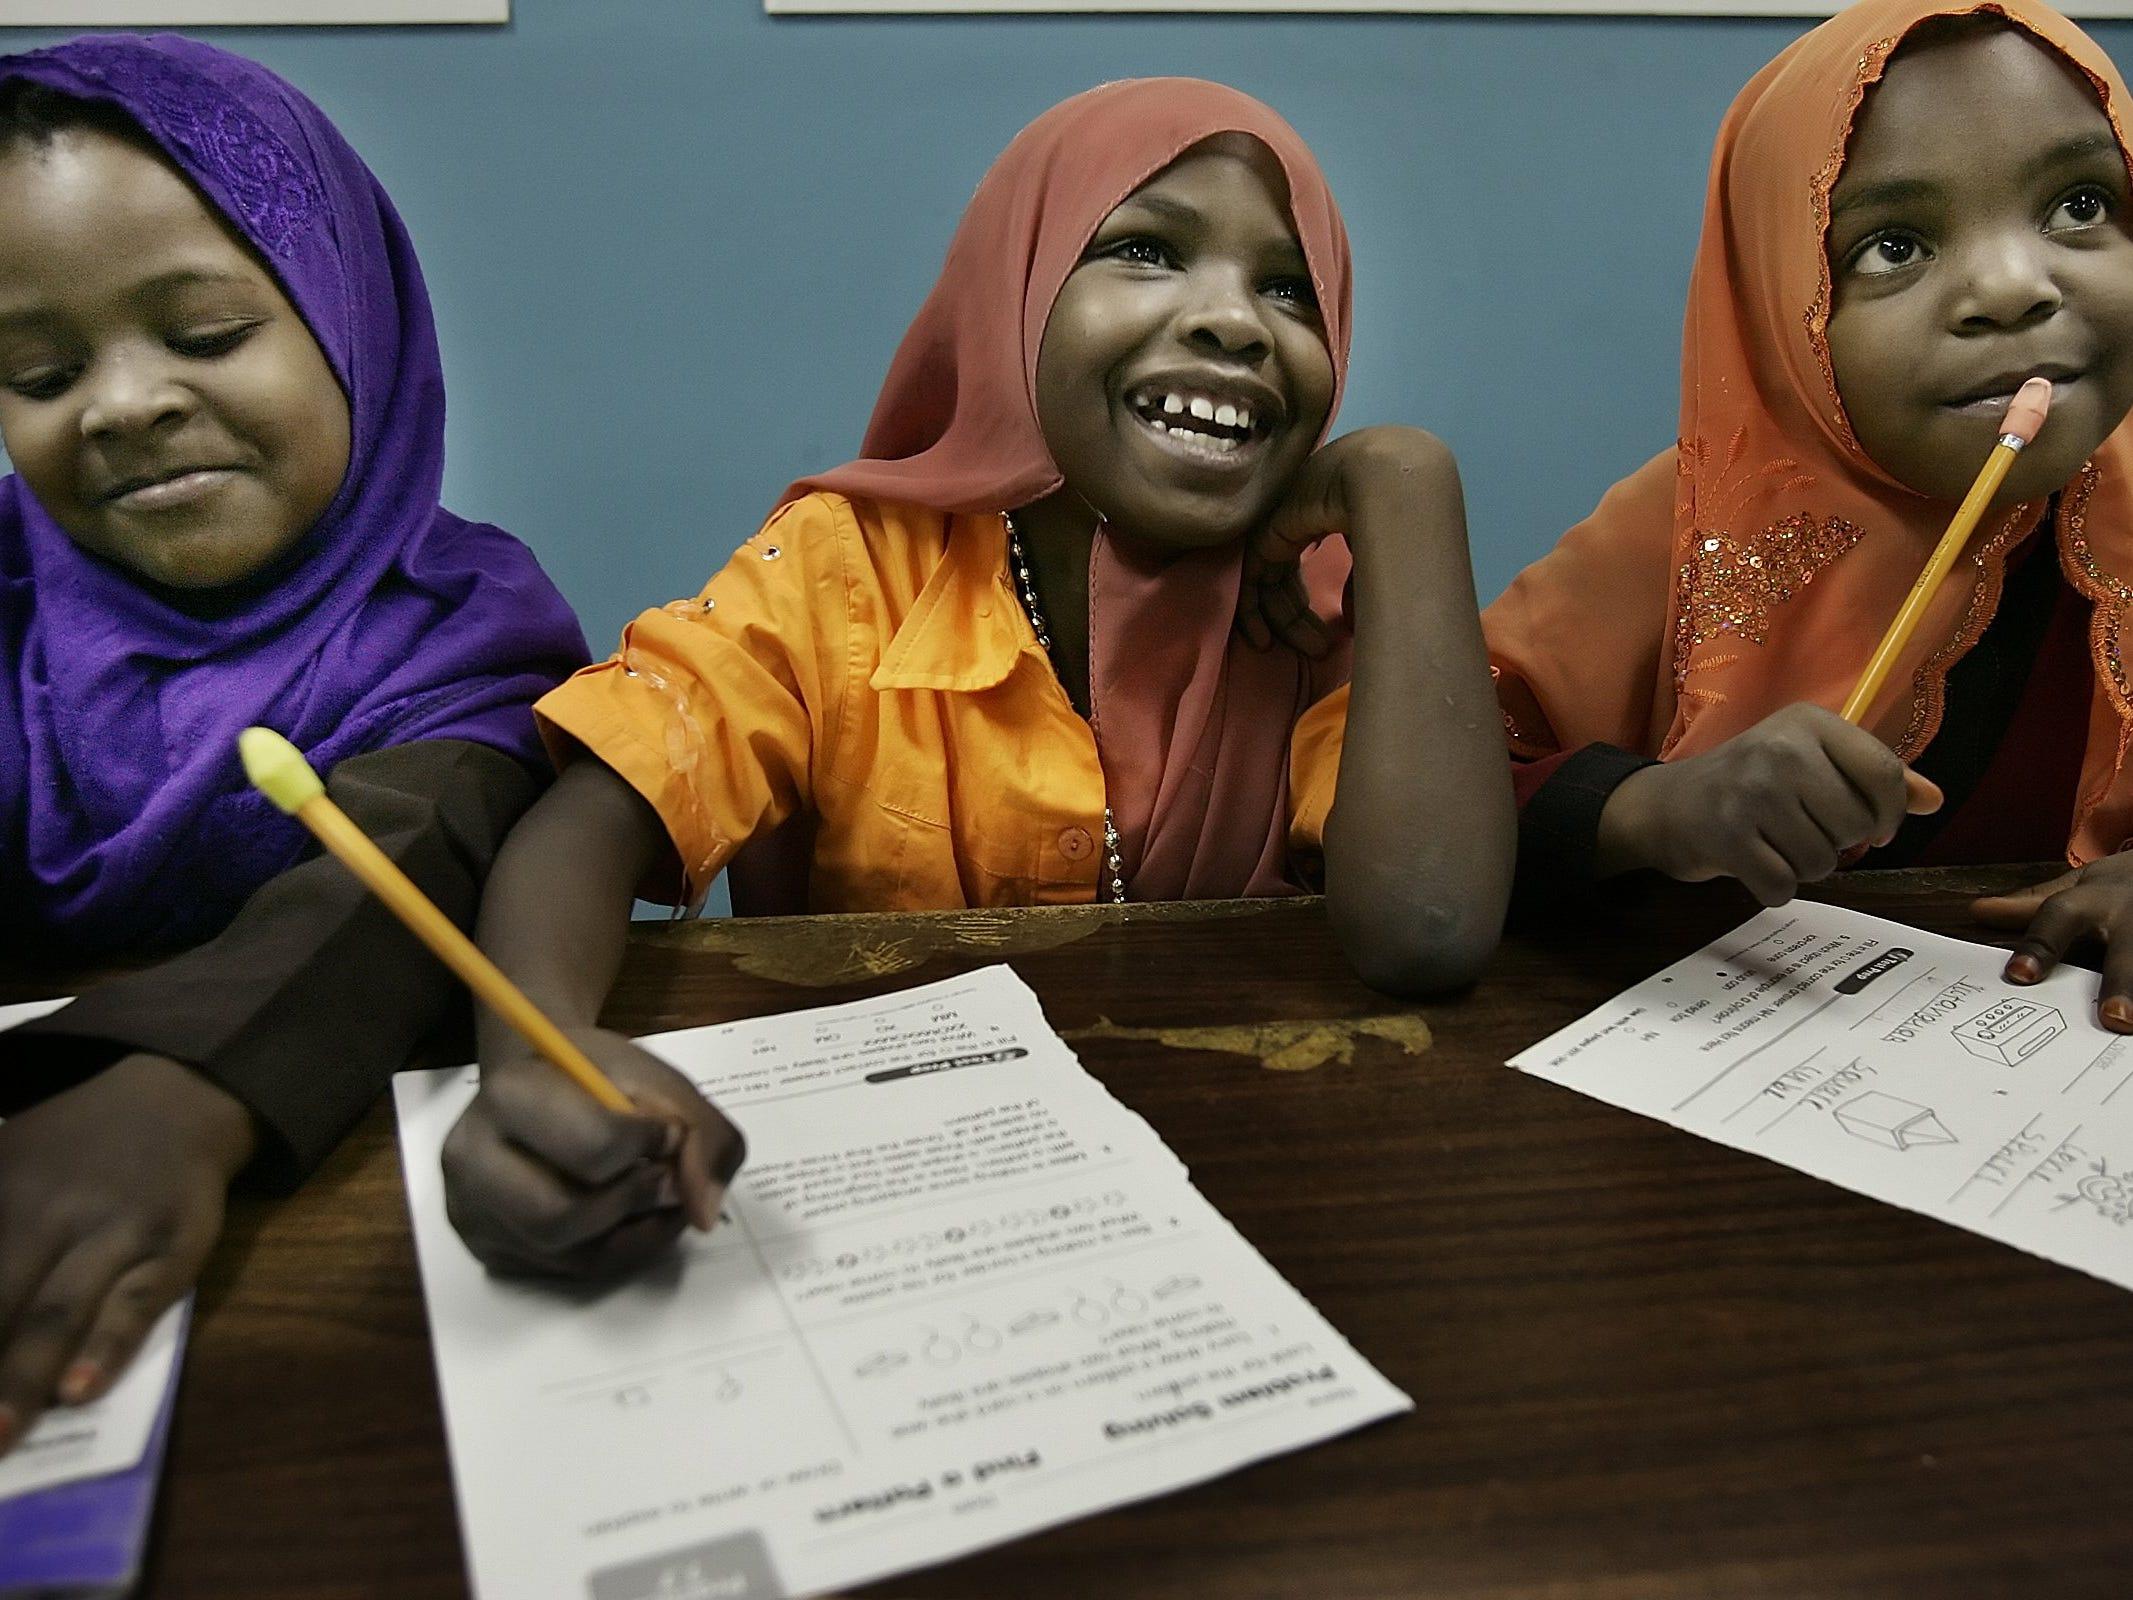 Shamsa Abdikadir, left, Rahama Bilal and Khadija Abdikadir study English at the CWA-Cayce Learning Center on Nov. 28, 2006.